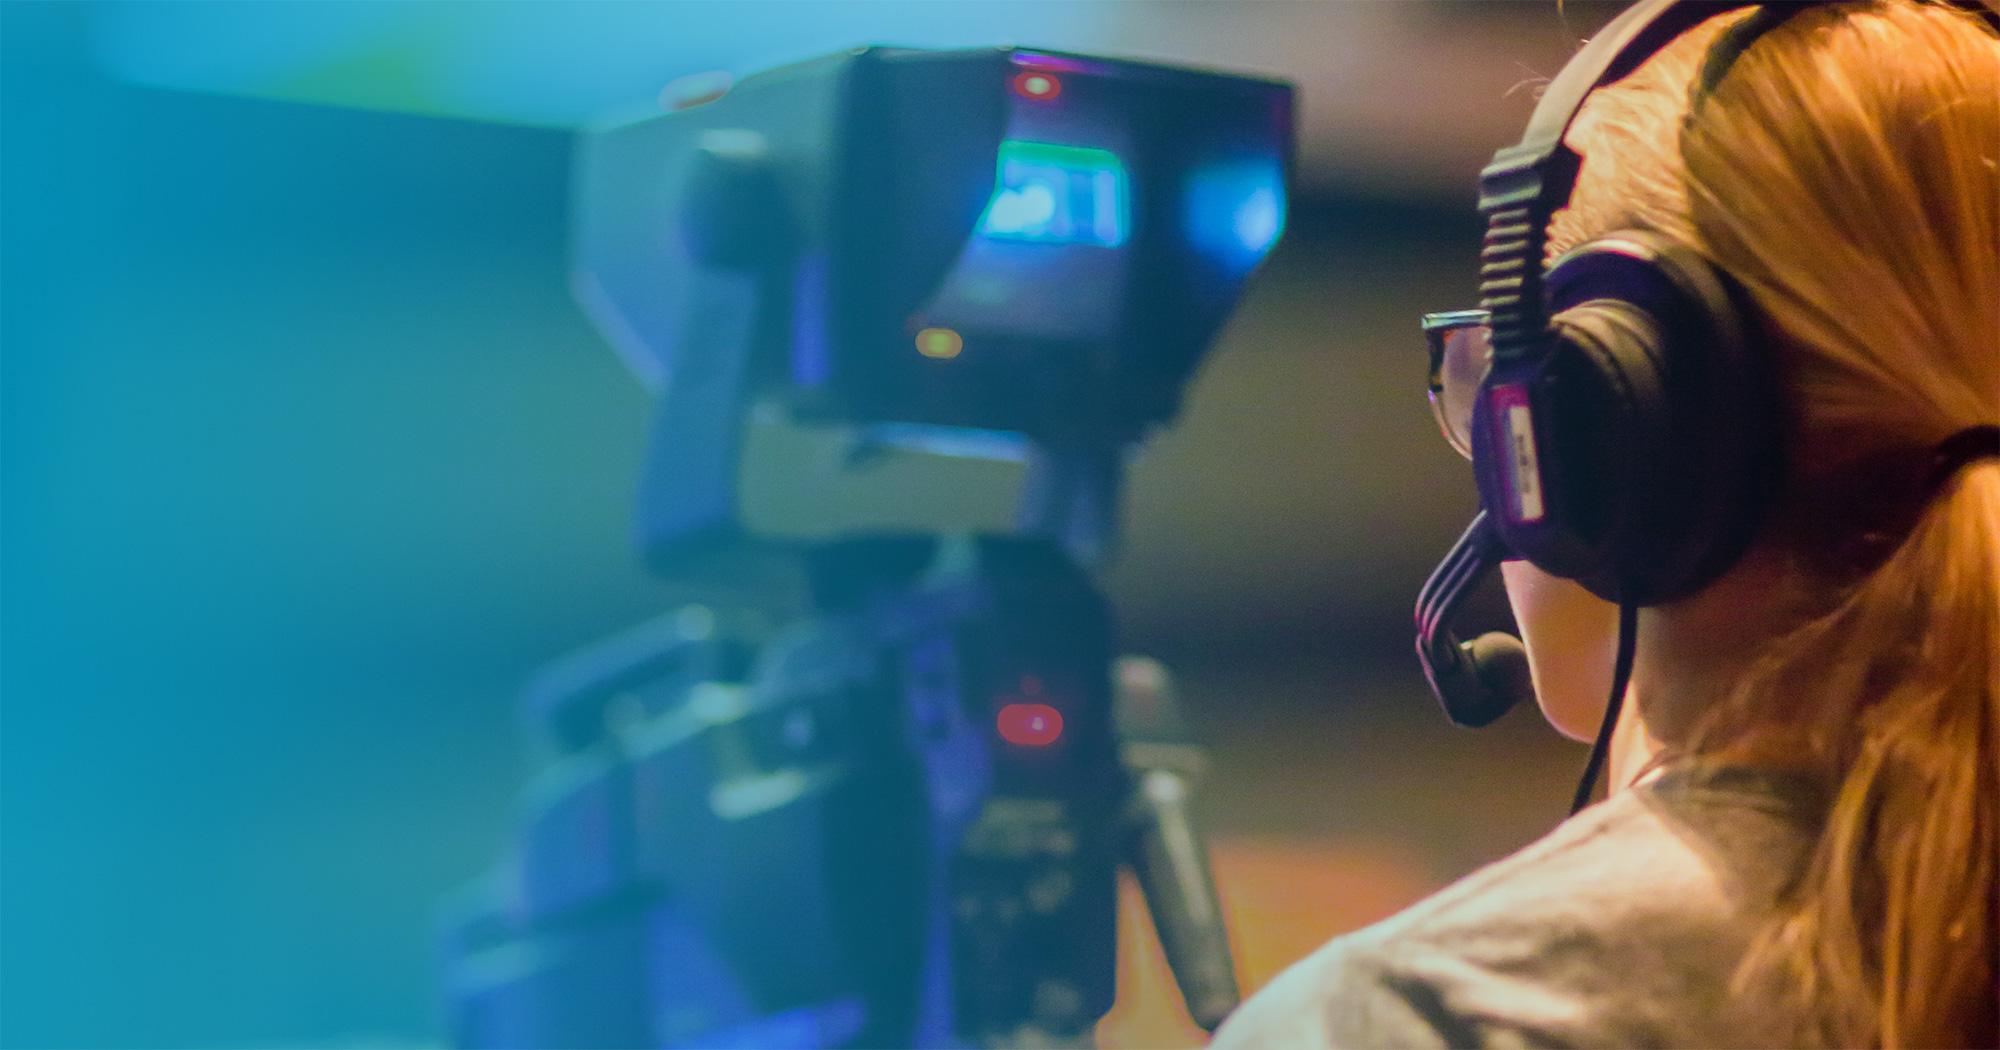 Broadcast camera recording media